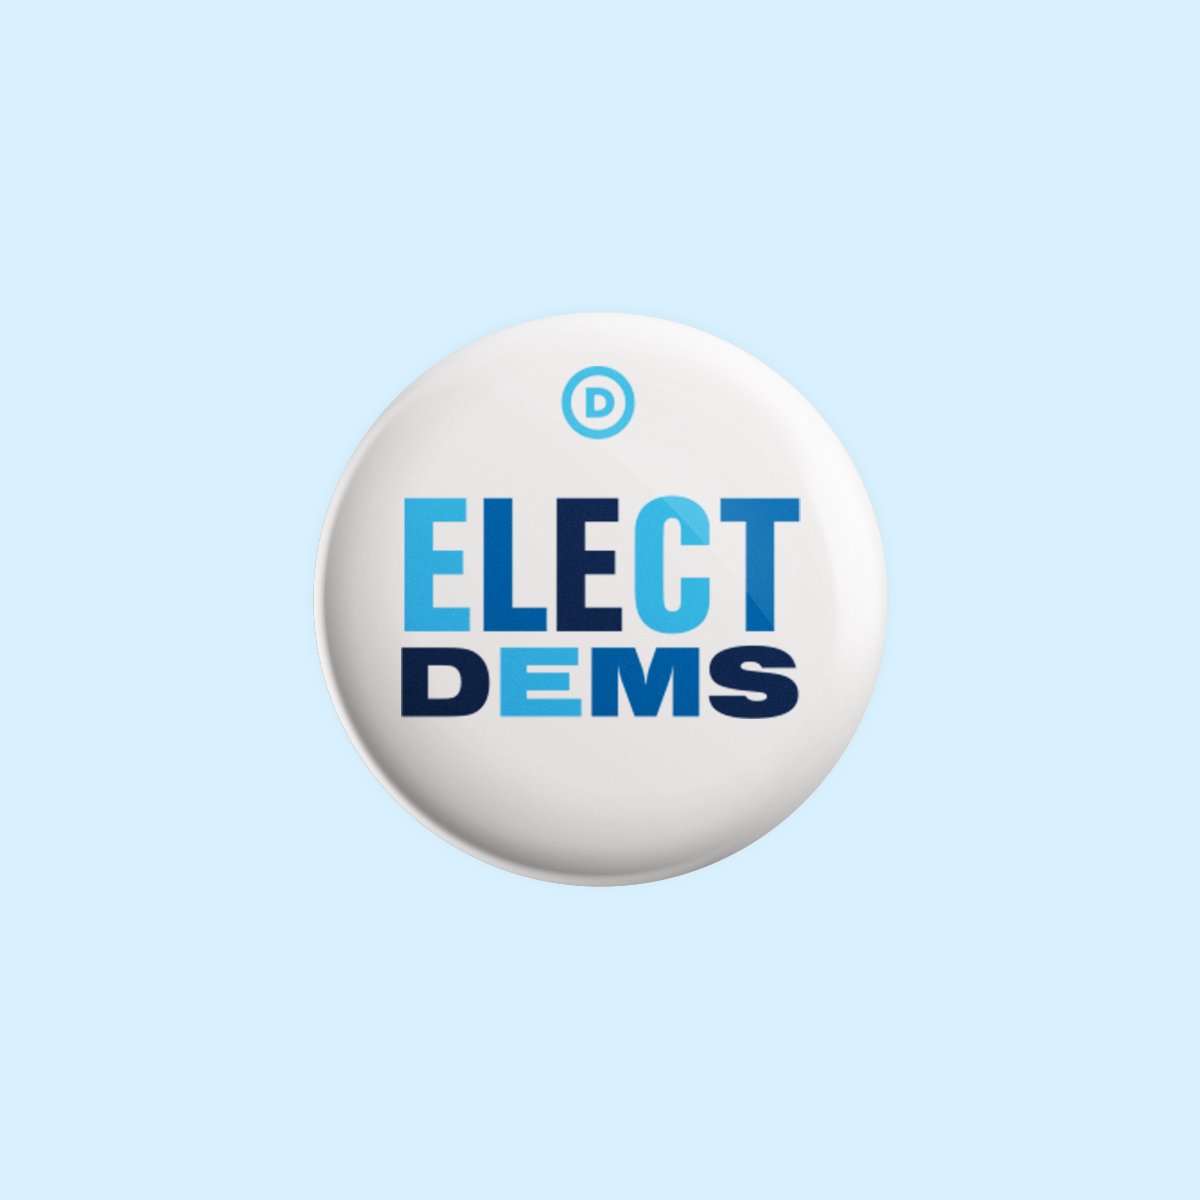 Elect_Dems_Button_2400x